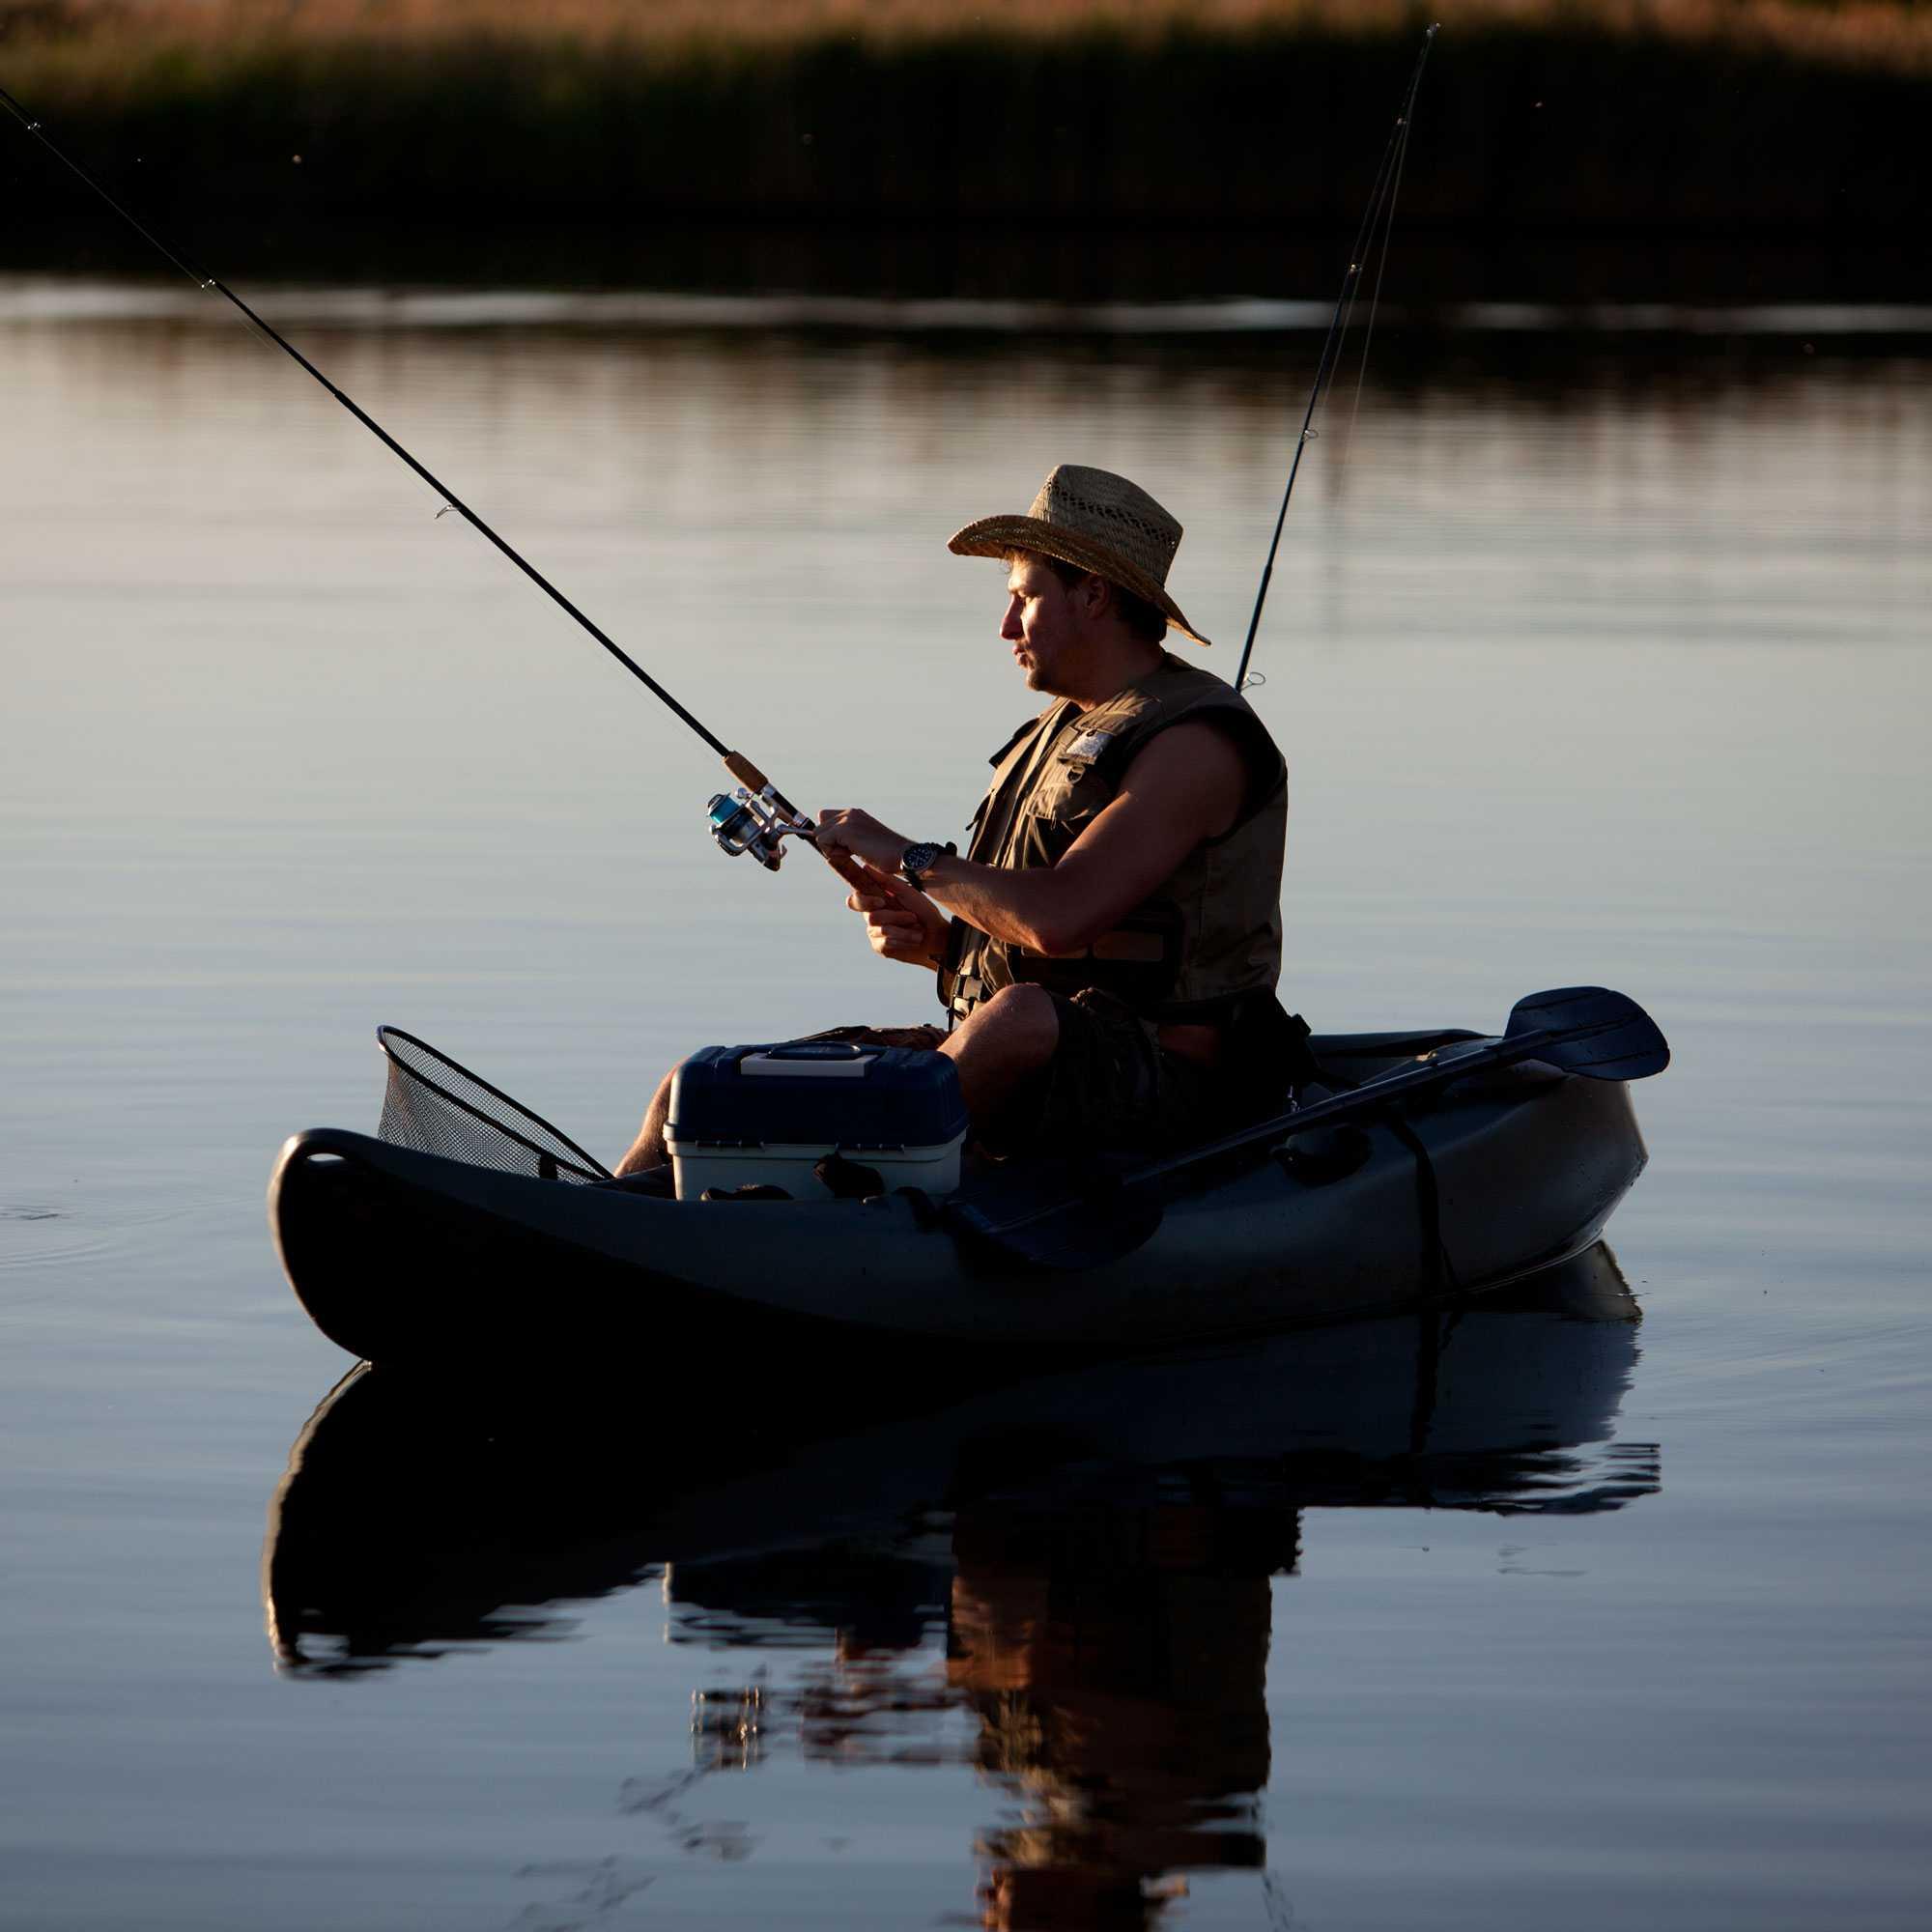 Lifetime Camouflage Kayak 10 Foot 90157 Sit On Top